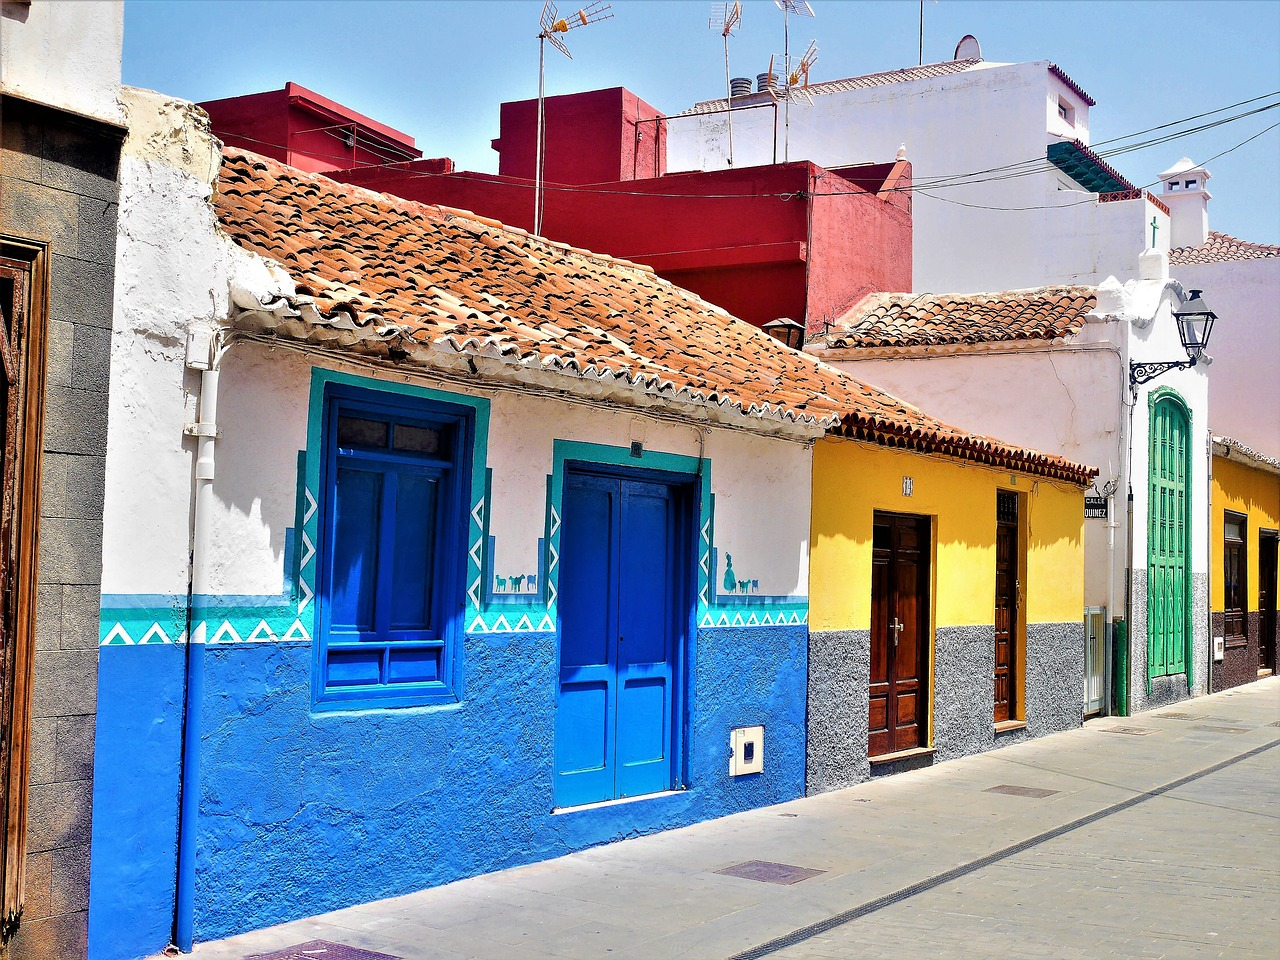 Puerto de la cruz die beliebteste Ecke für Singlereisende